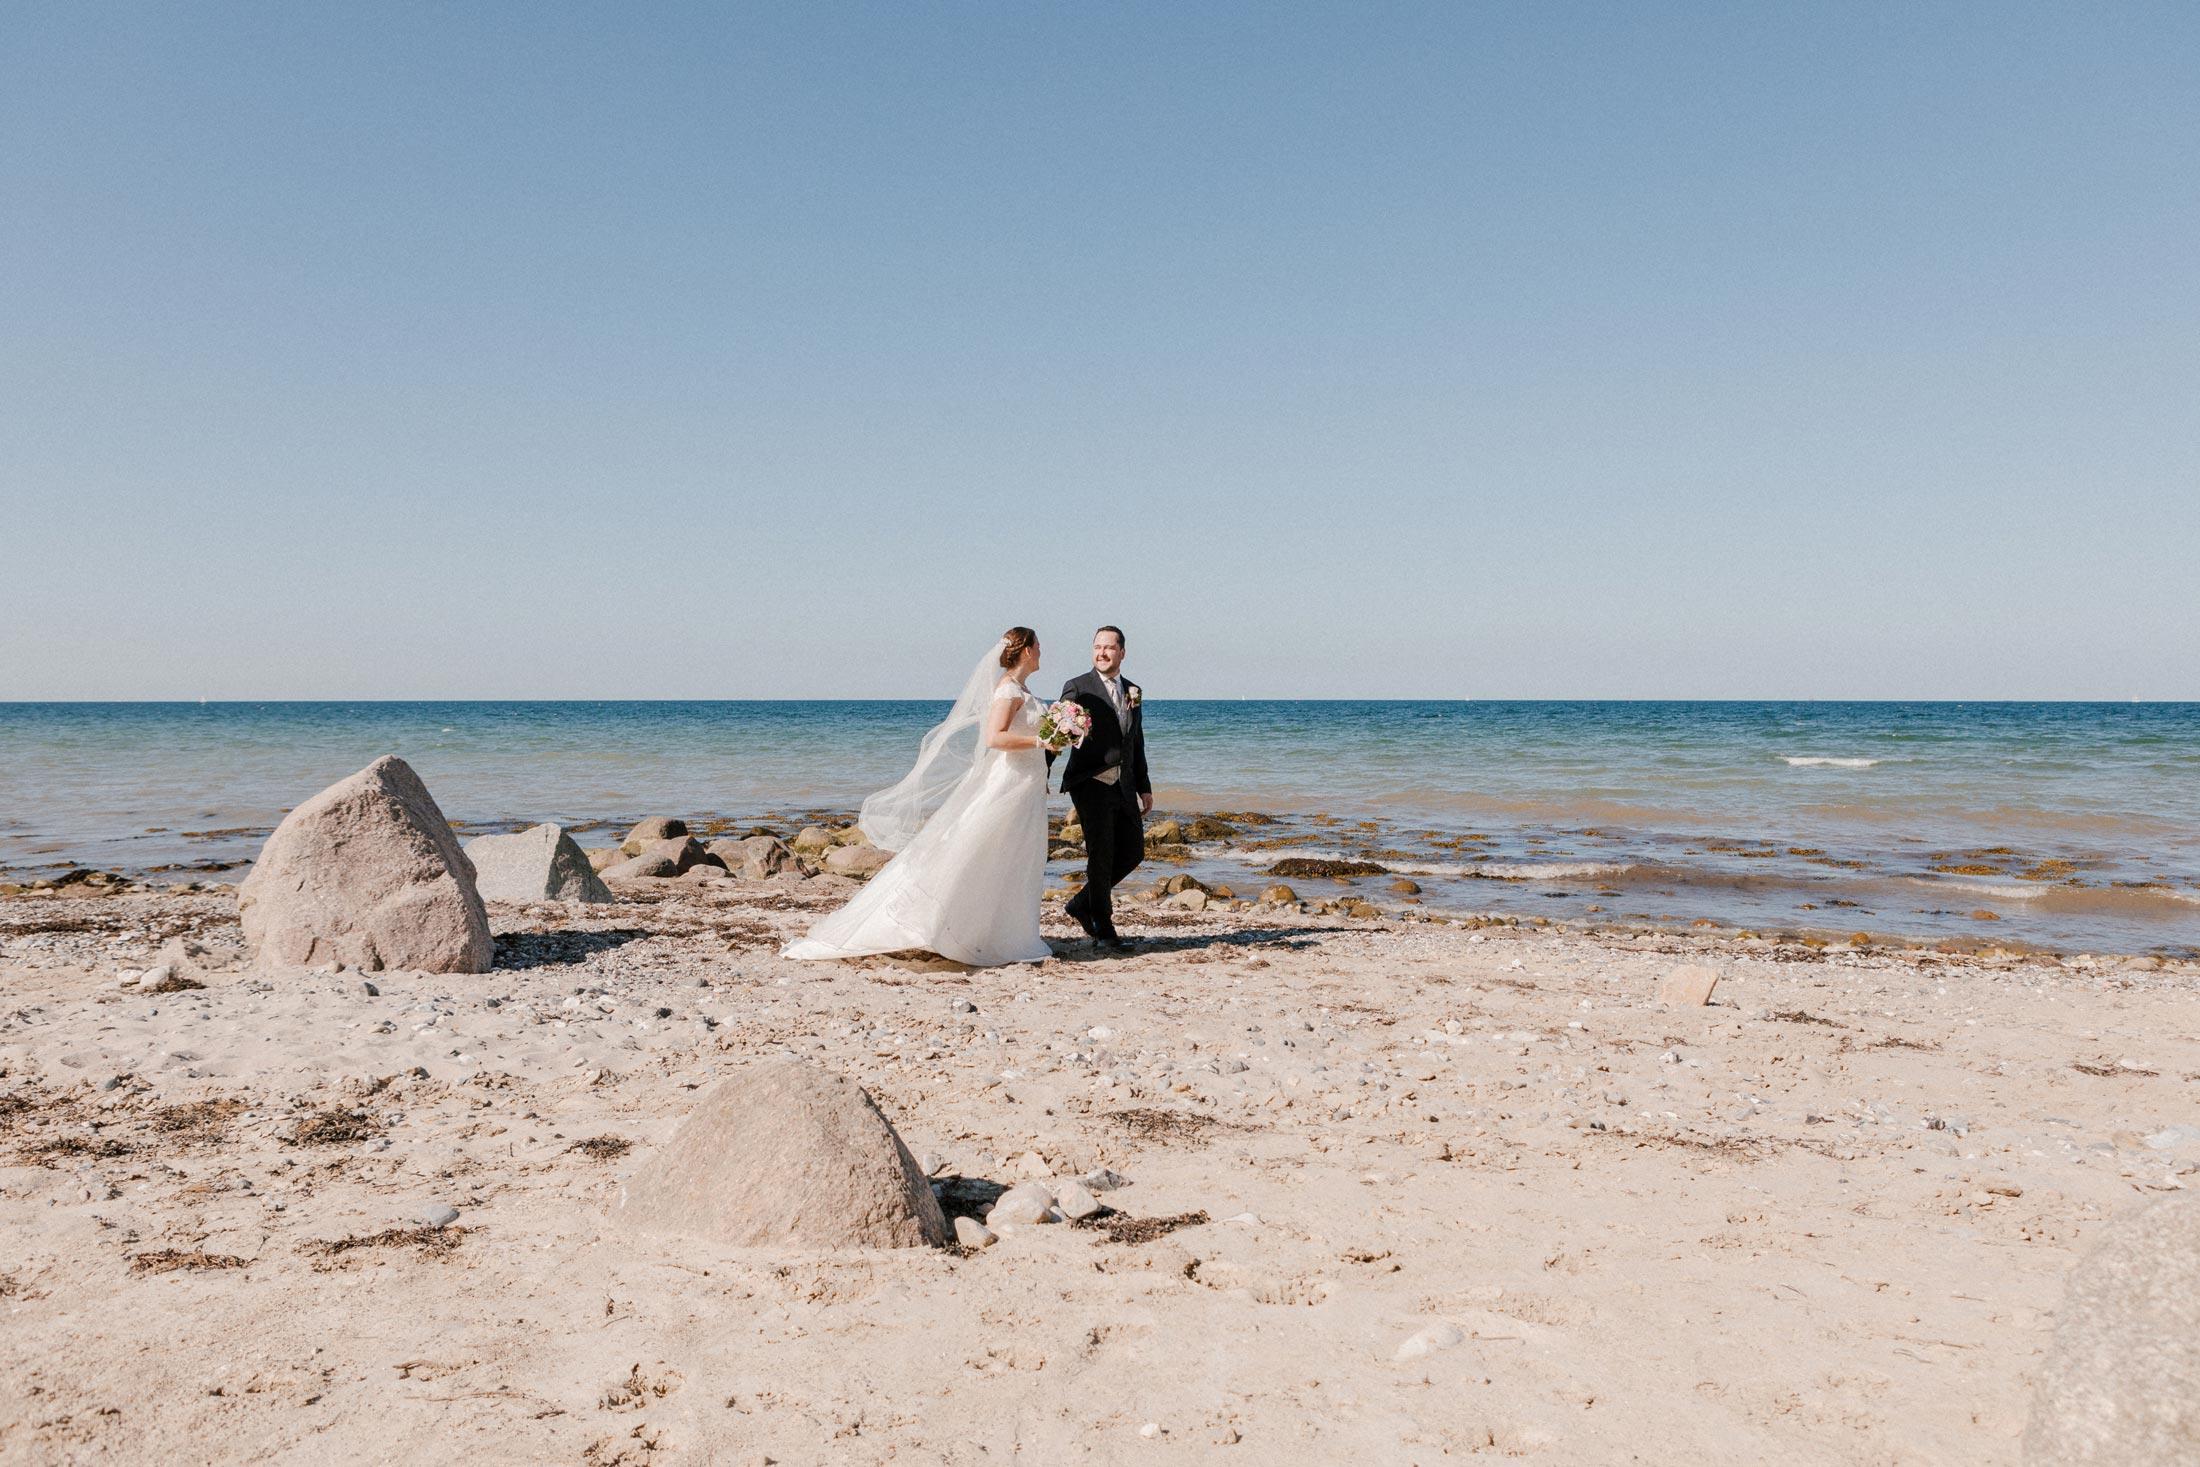 After Wedding am Strand in Schwedeneck